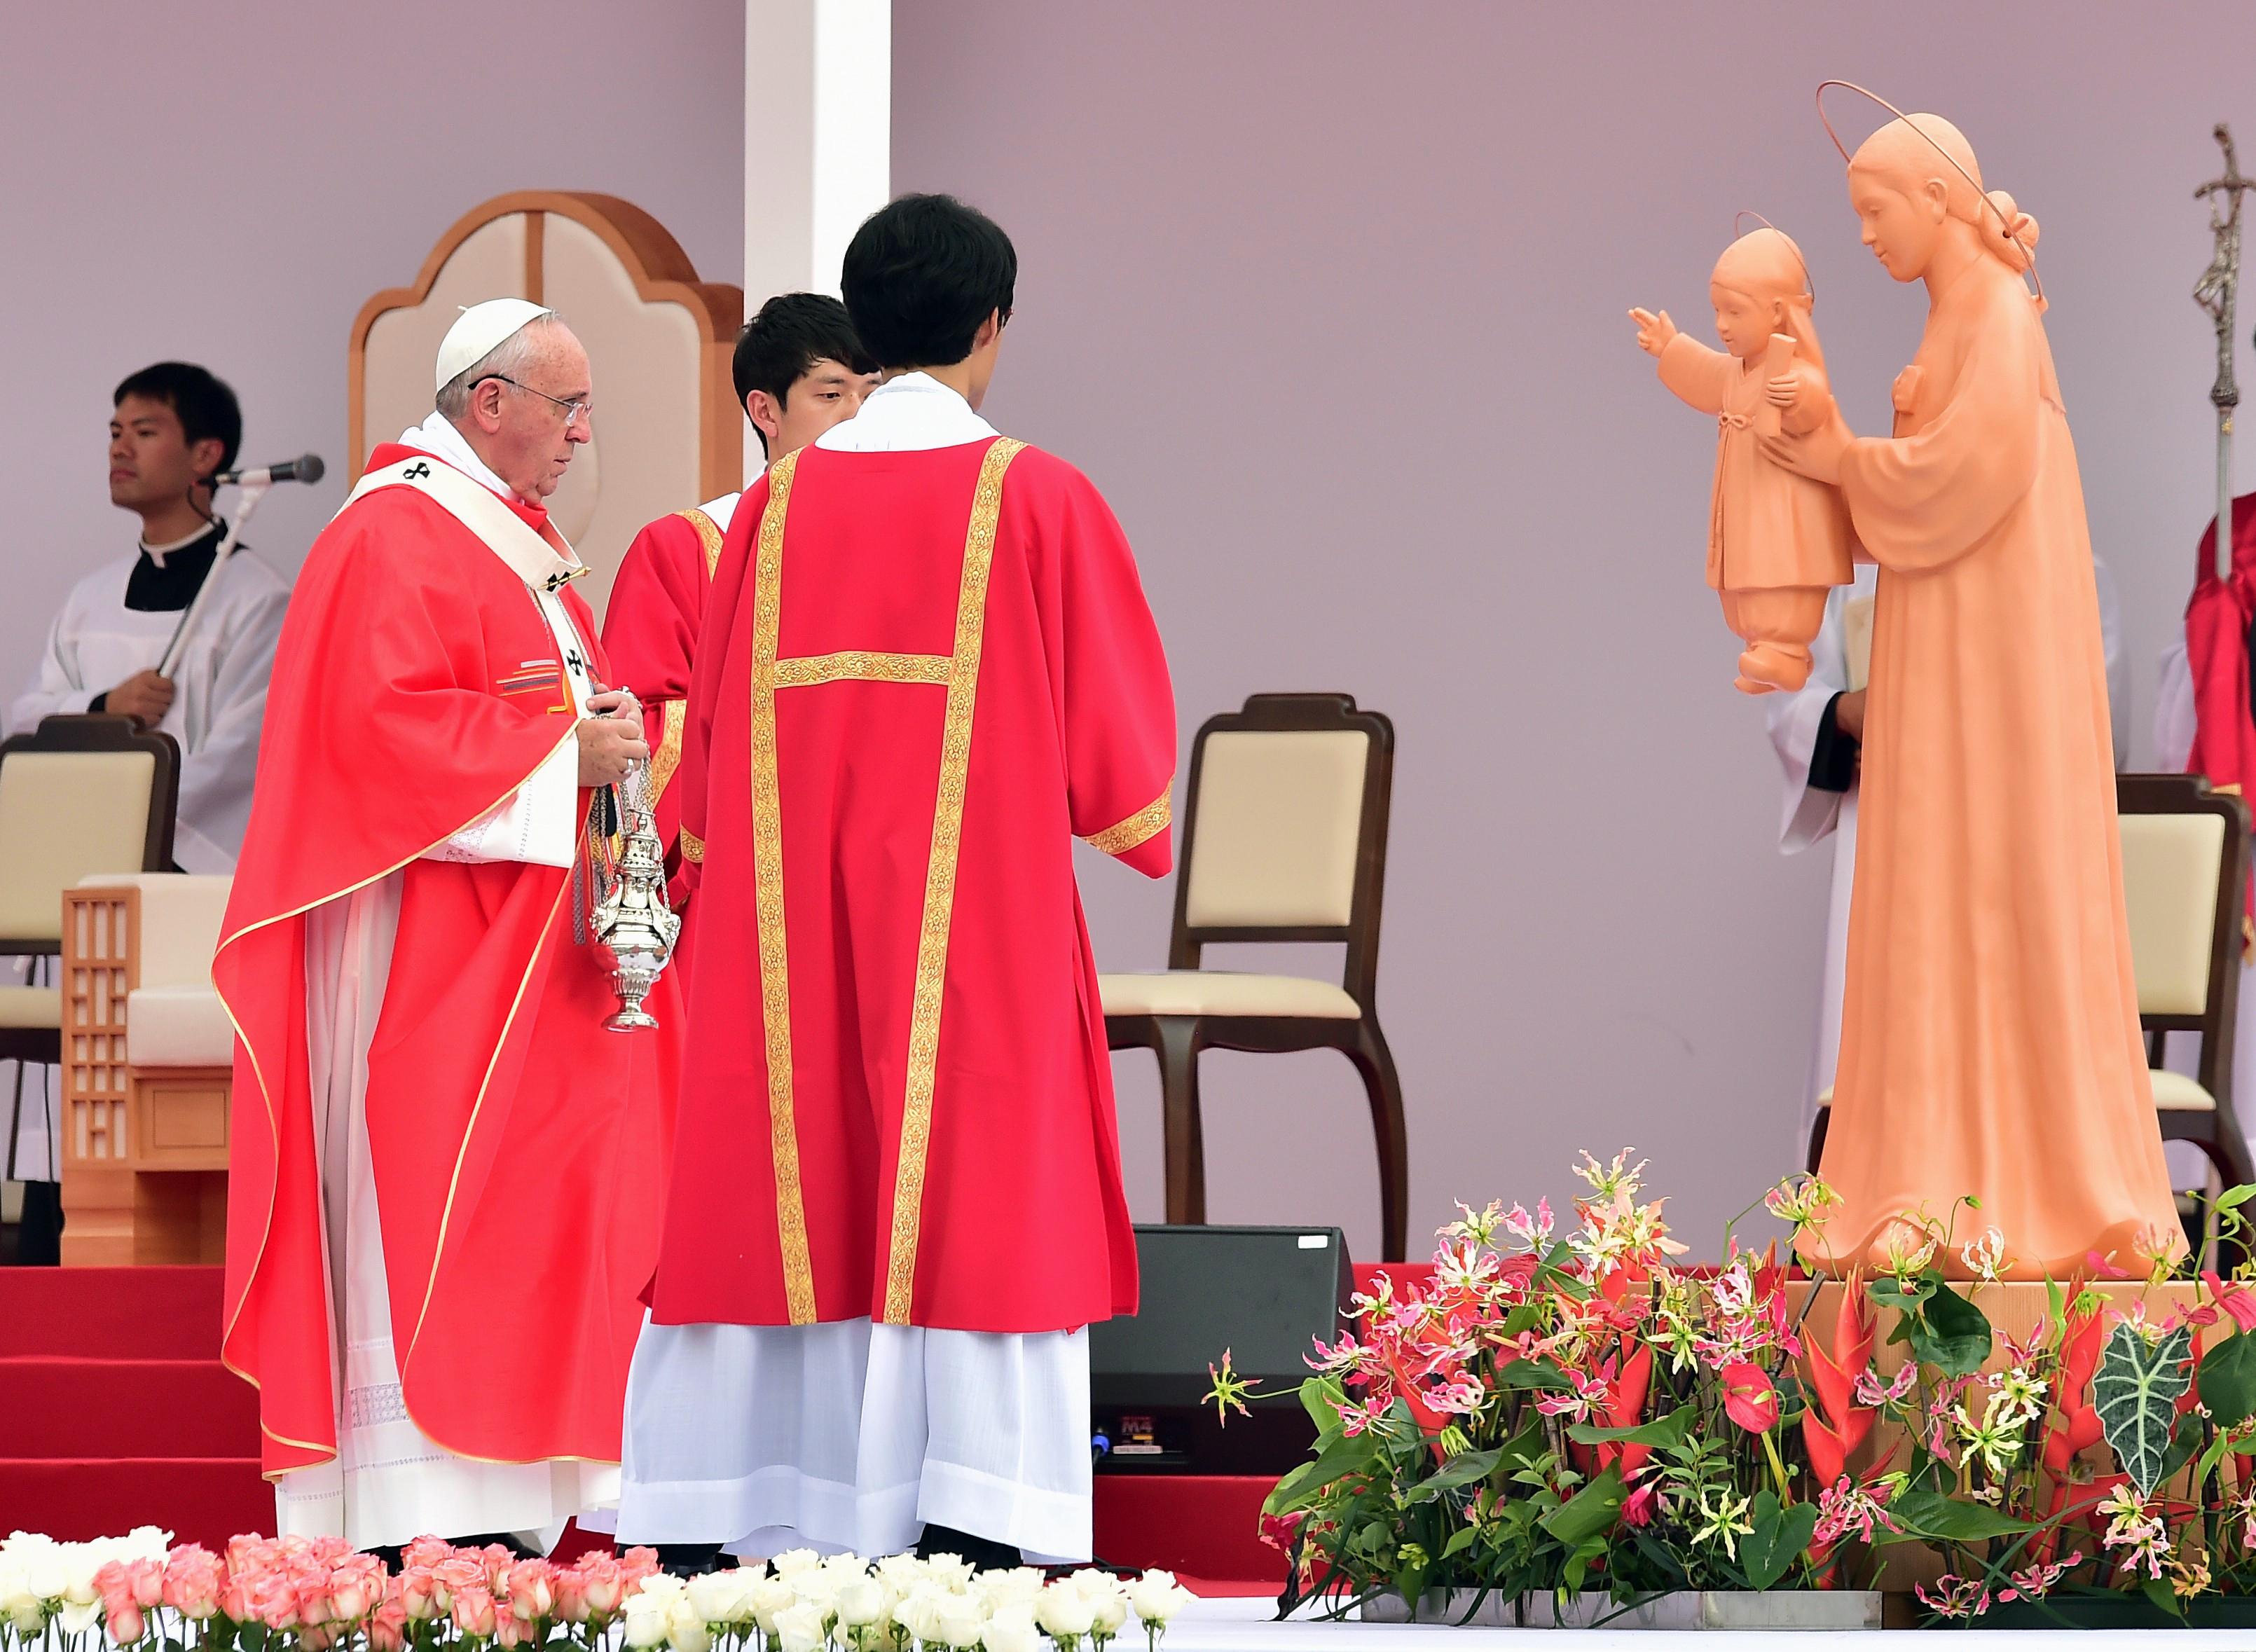 Pope beatifies 124 Korean martyrs in Gwanghwamun ceremony